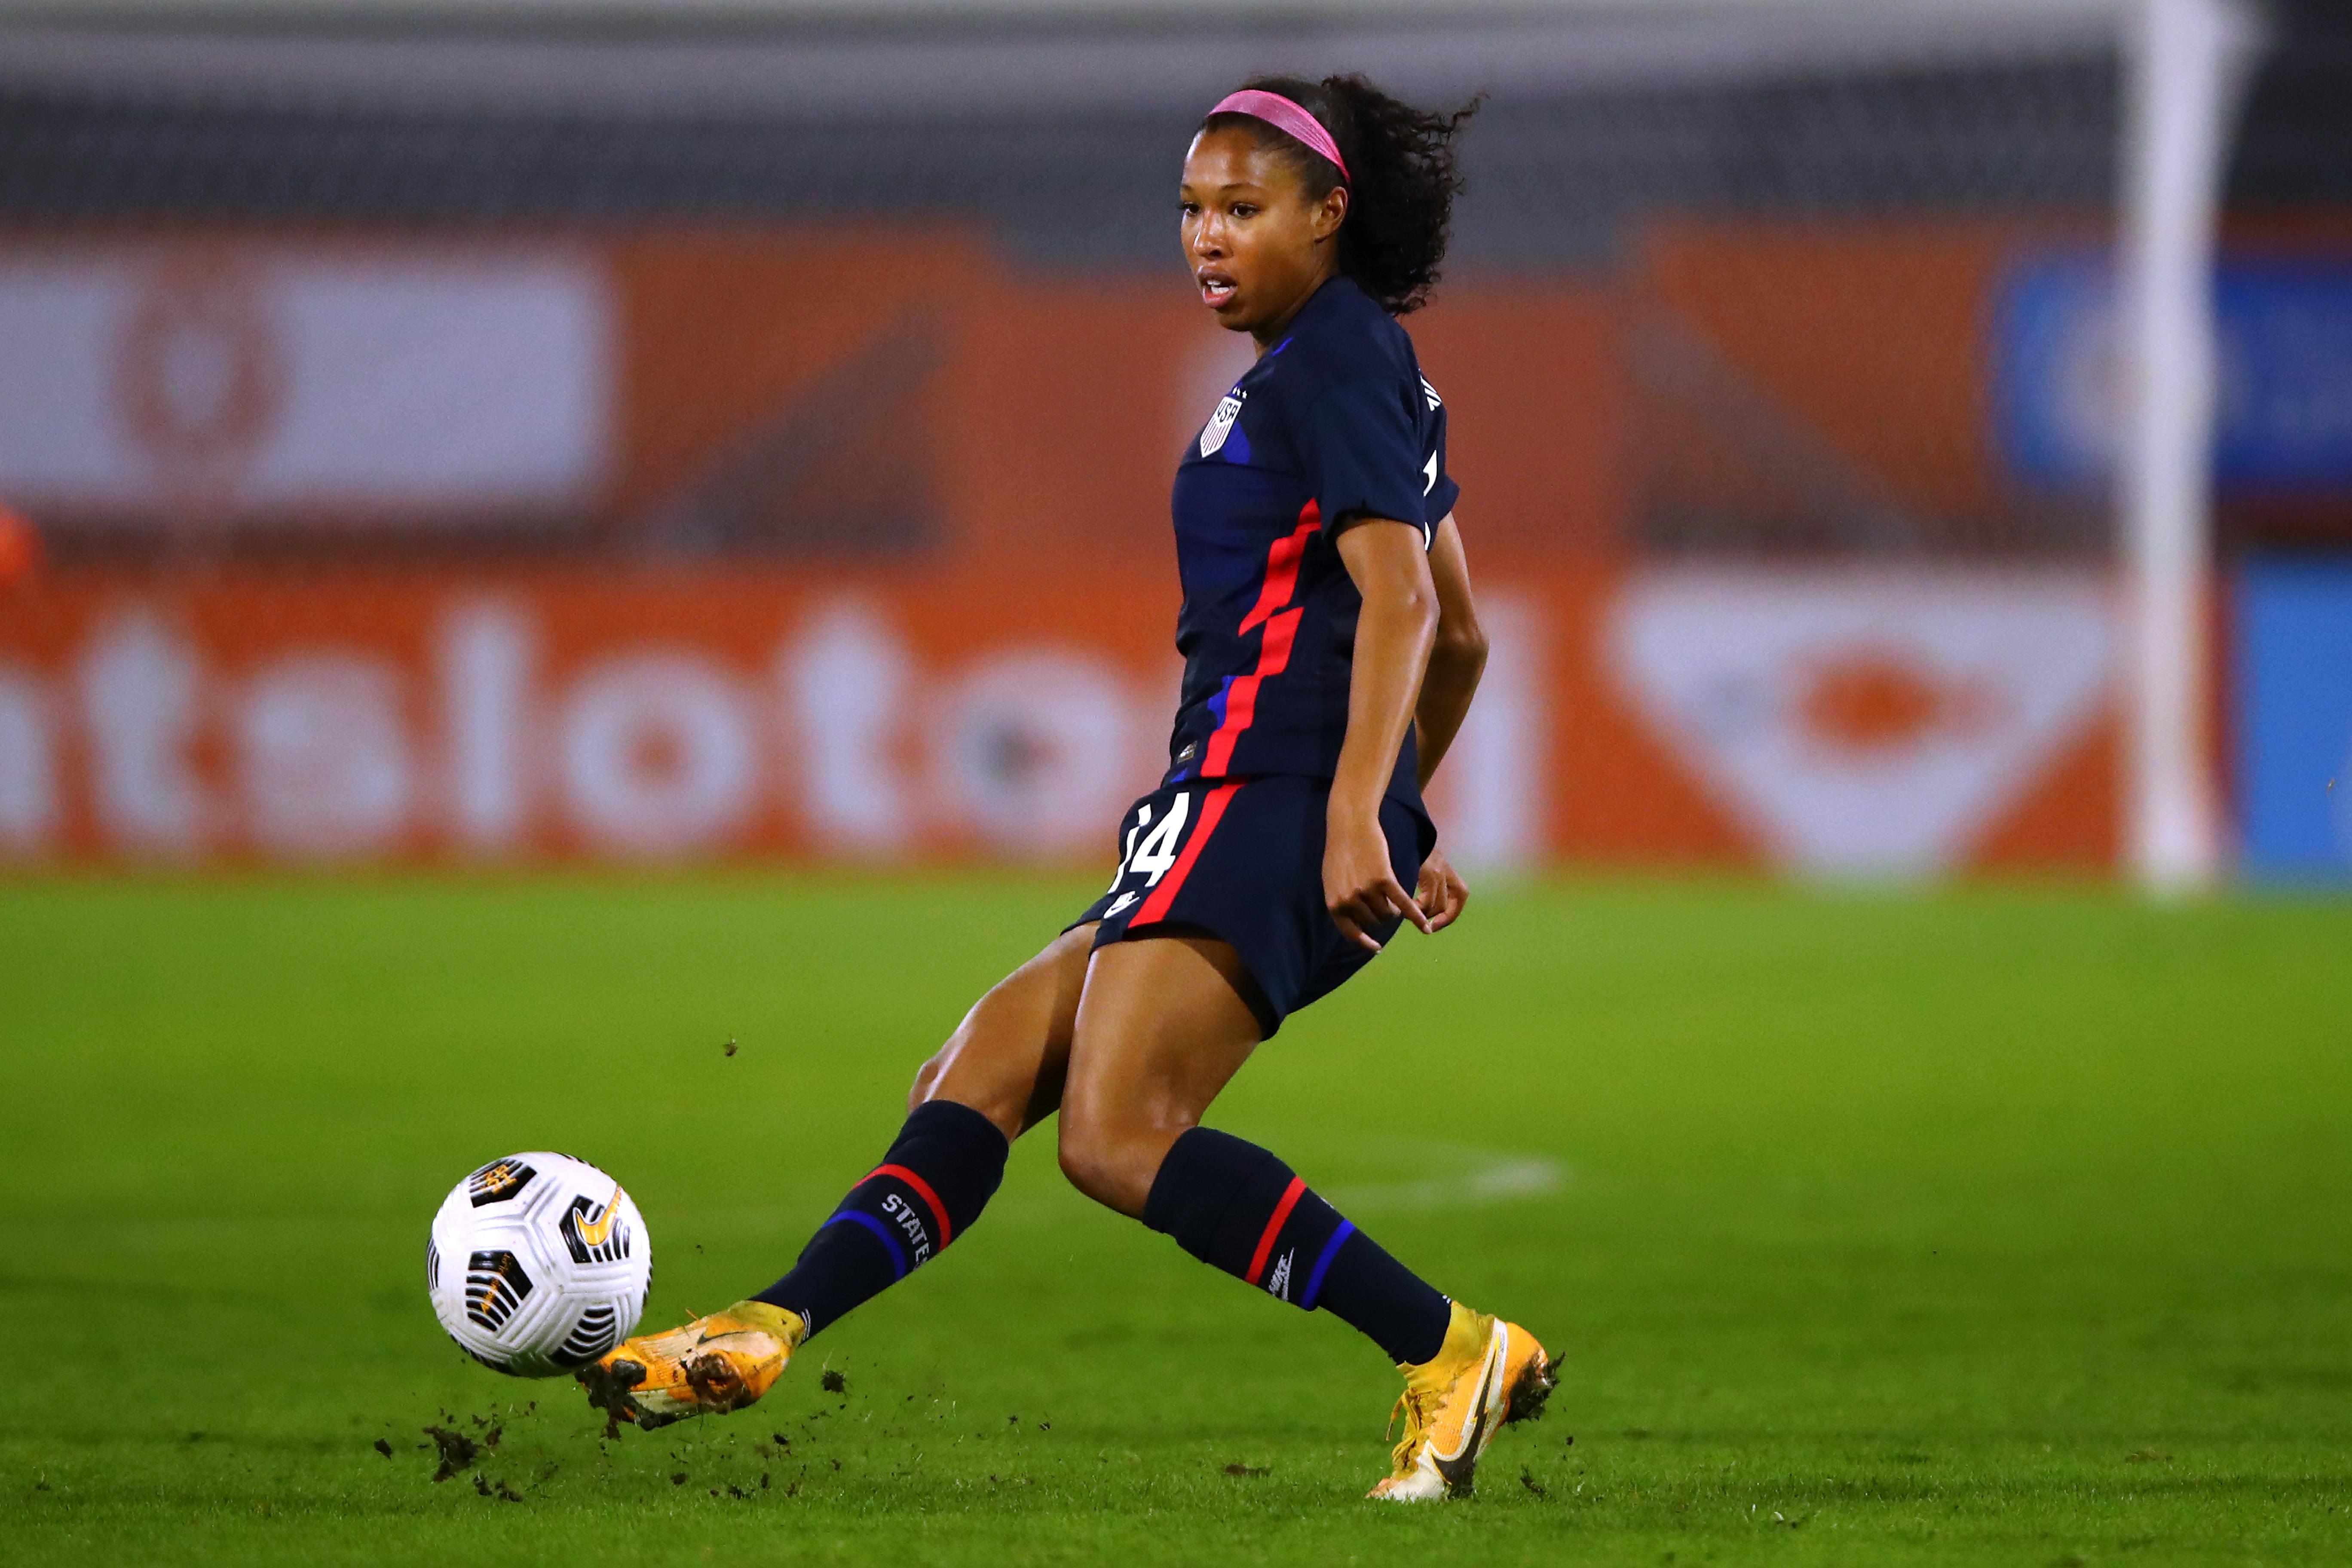 Netherlands Women v USA Women - International Friendly